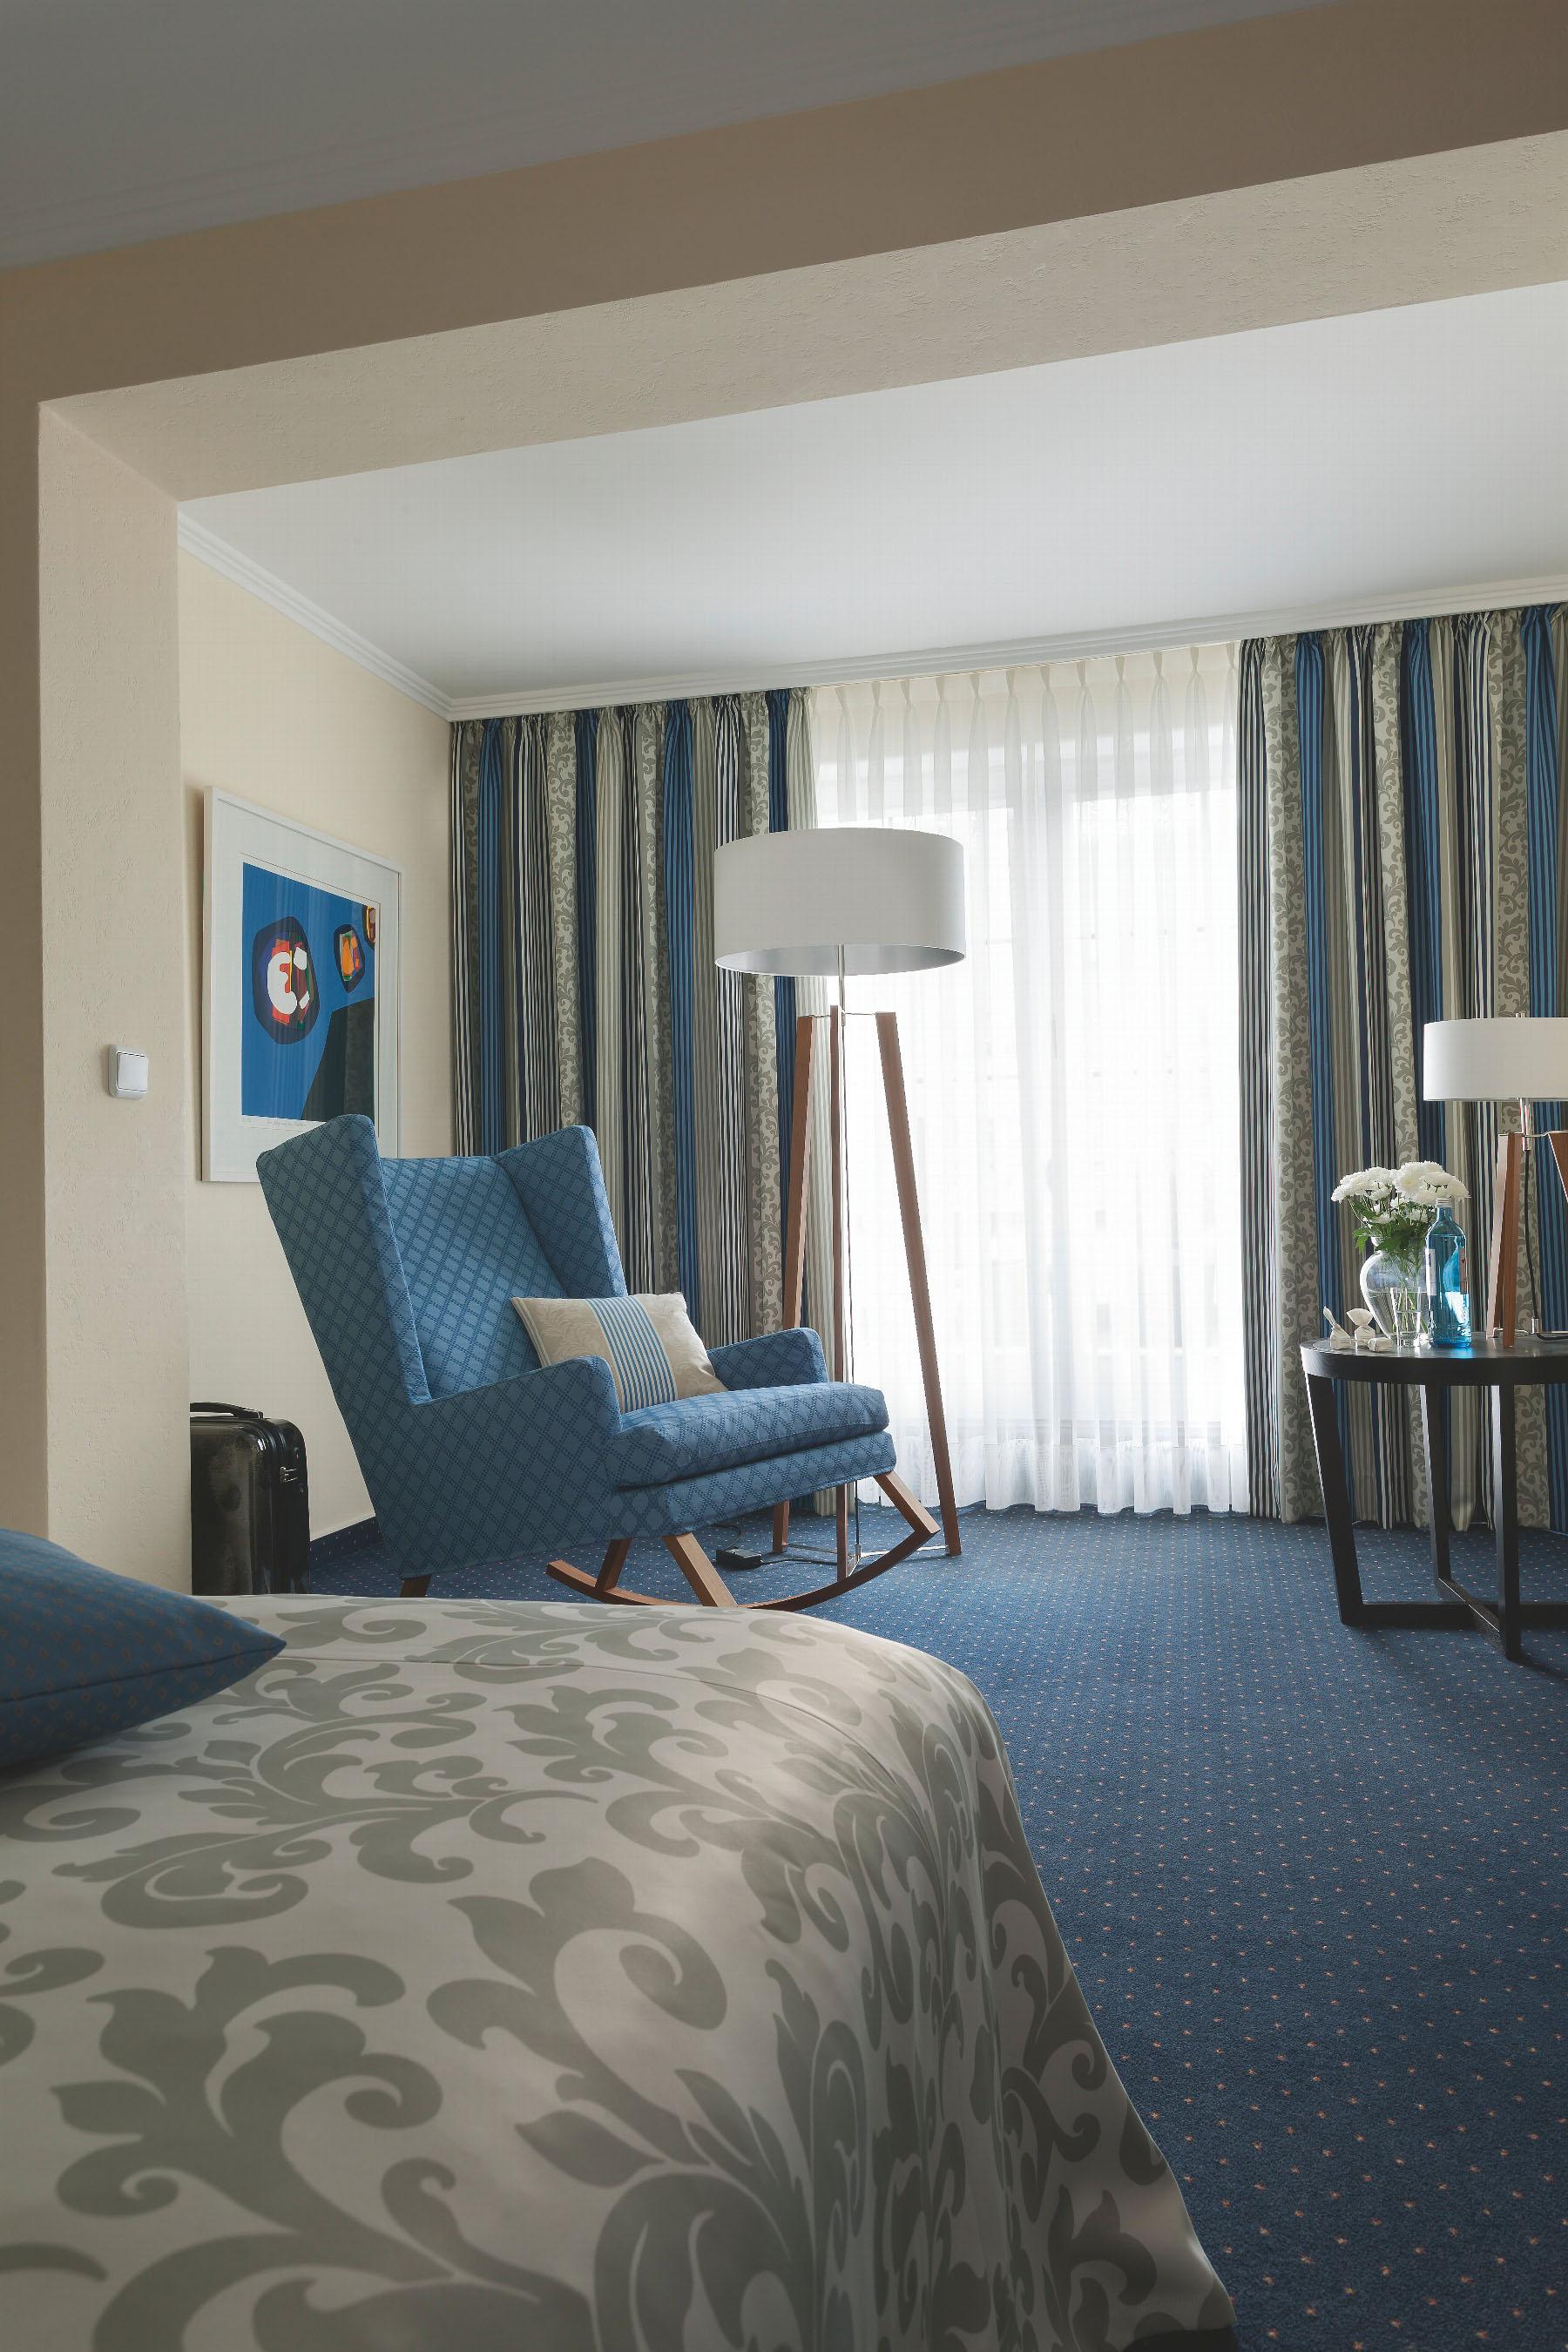 decoration fabric mezzanotte 1 8786 050 jab anstoetz. Black Bedroom Furniture Sets. Home Design Ideas